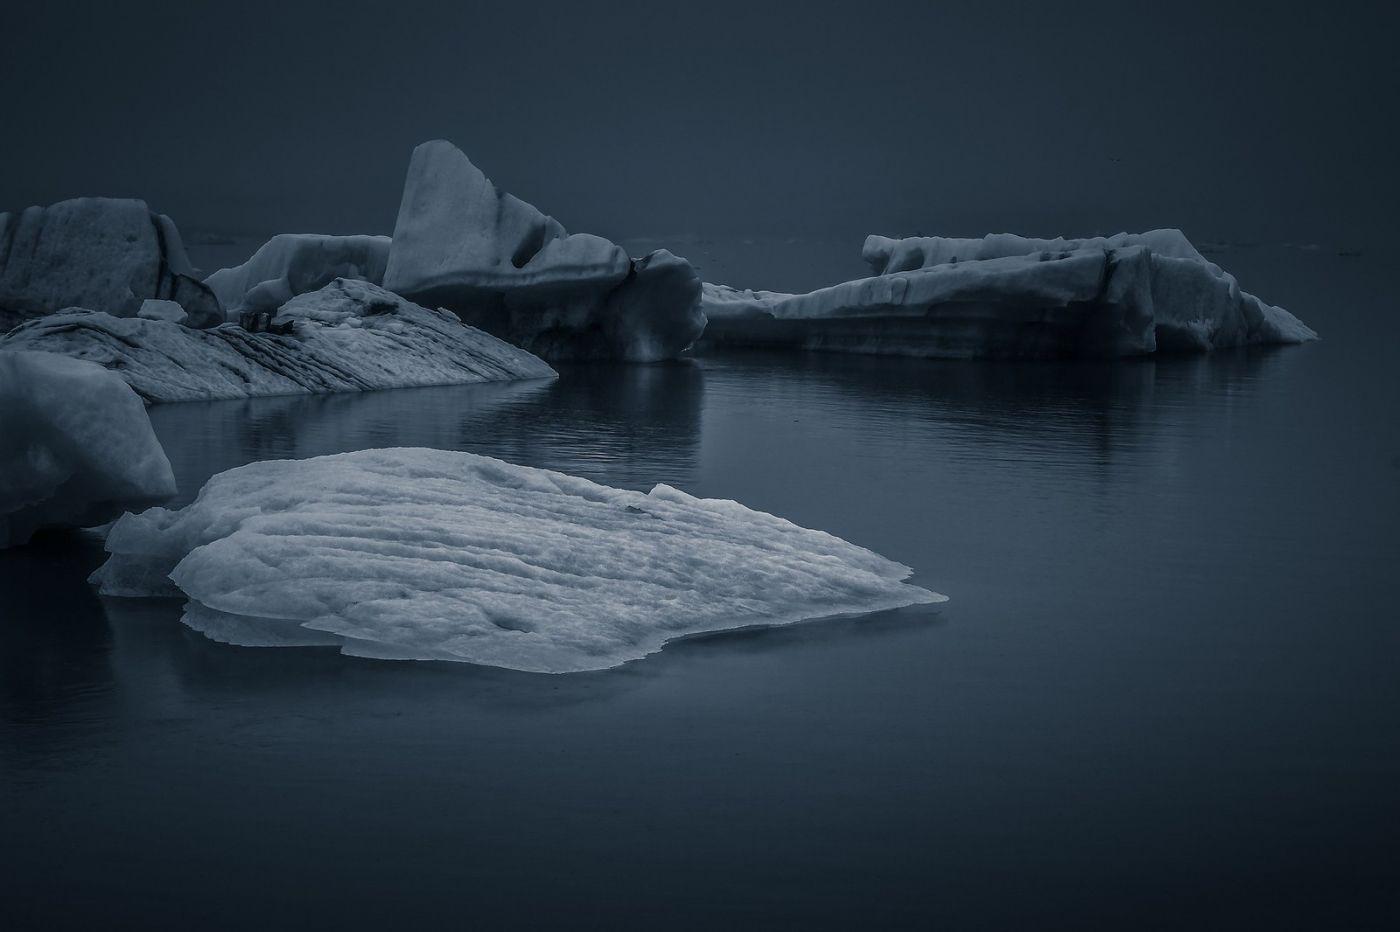 冰岛冰川泻湖(Glacier Lagoon),流动的冰川_图1-7